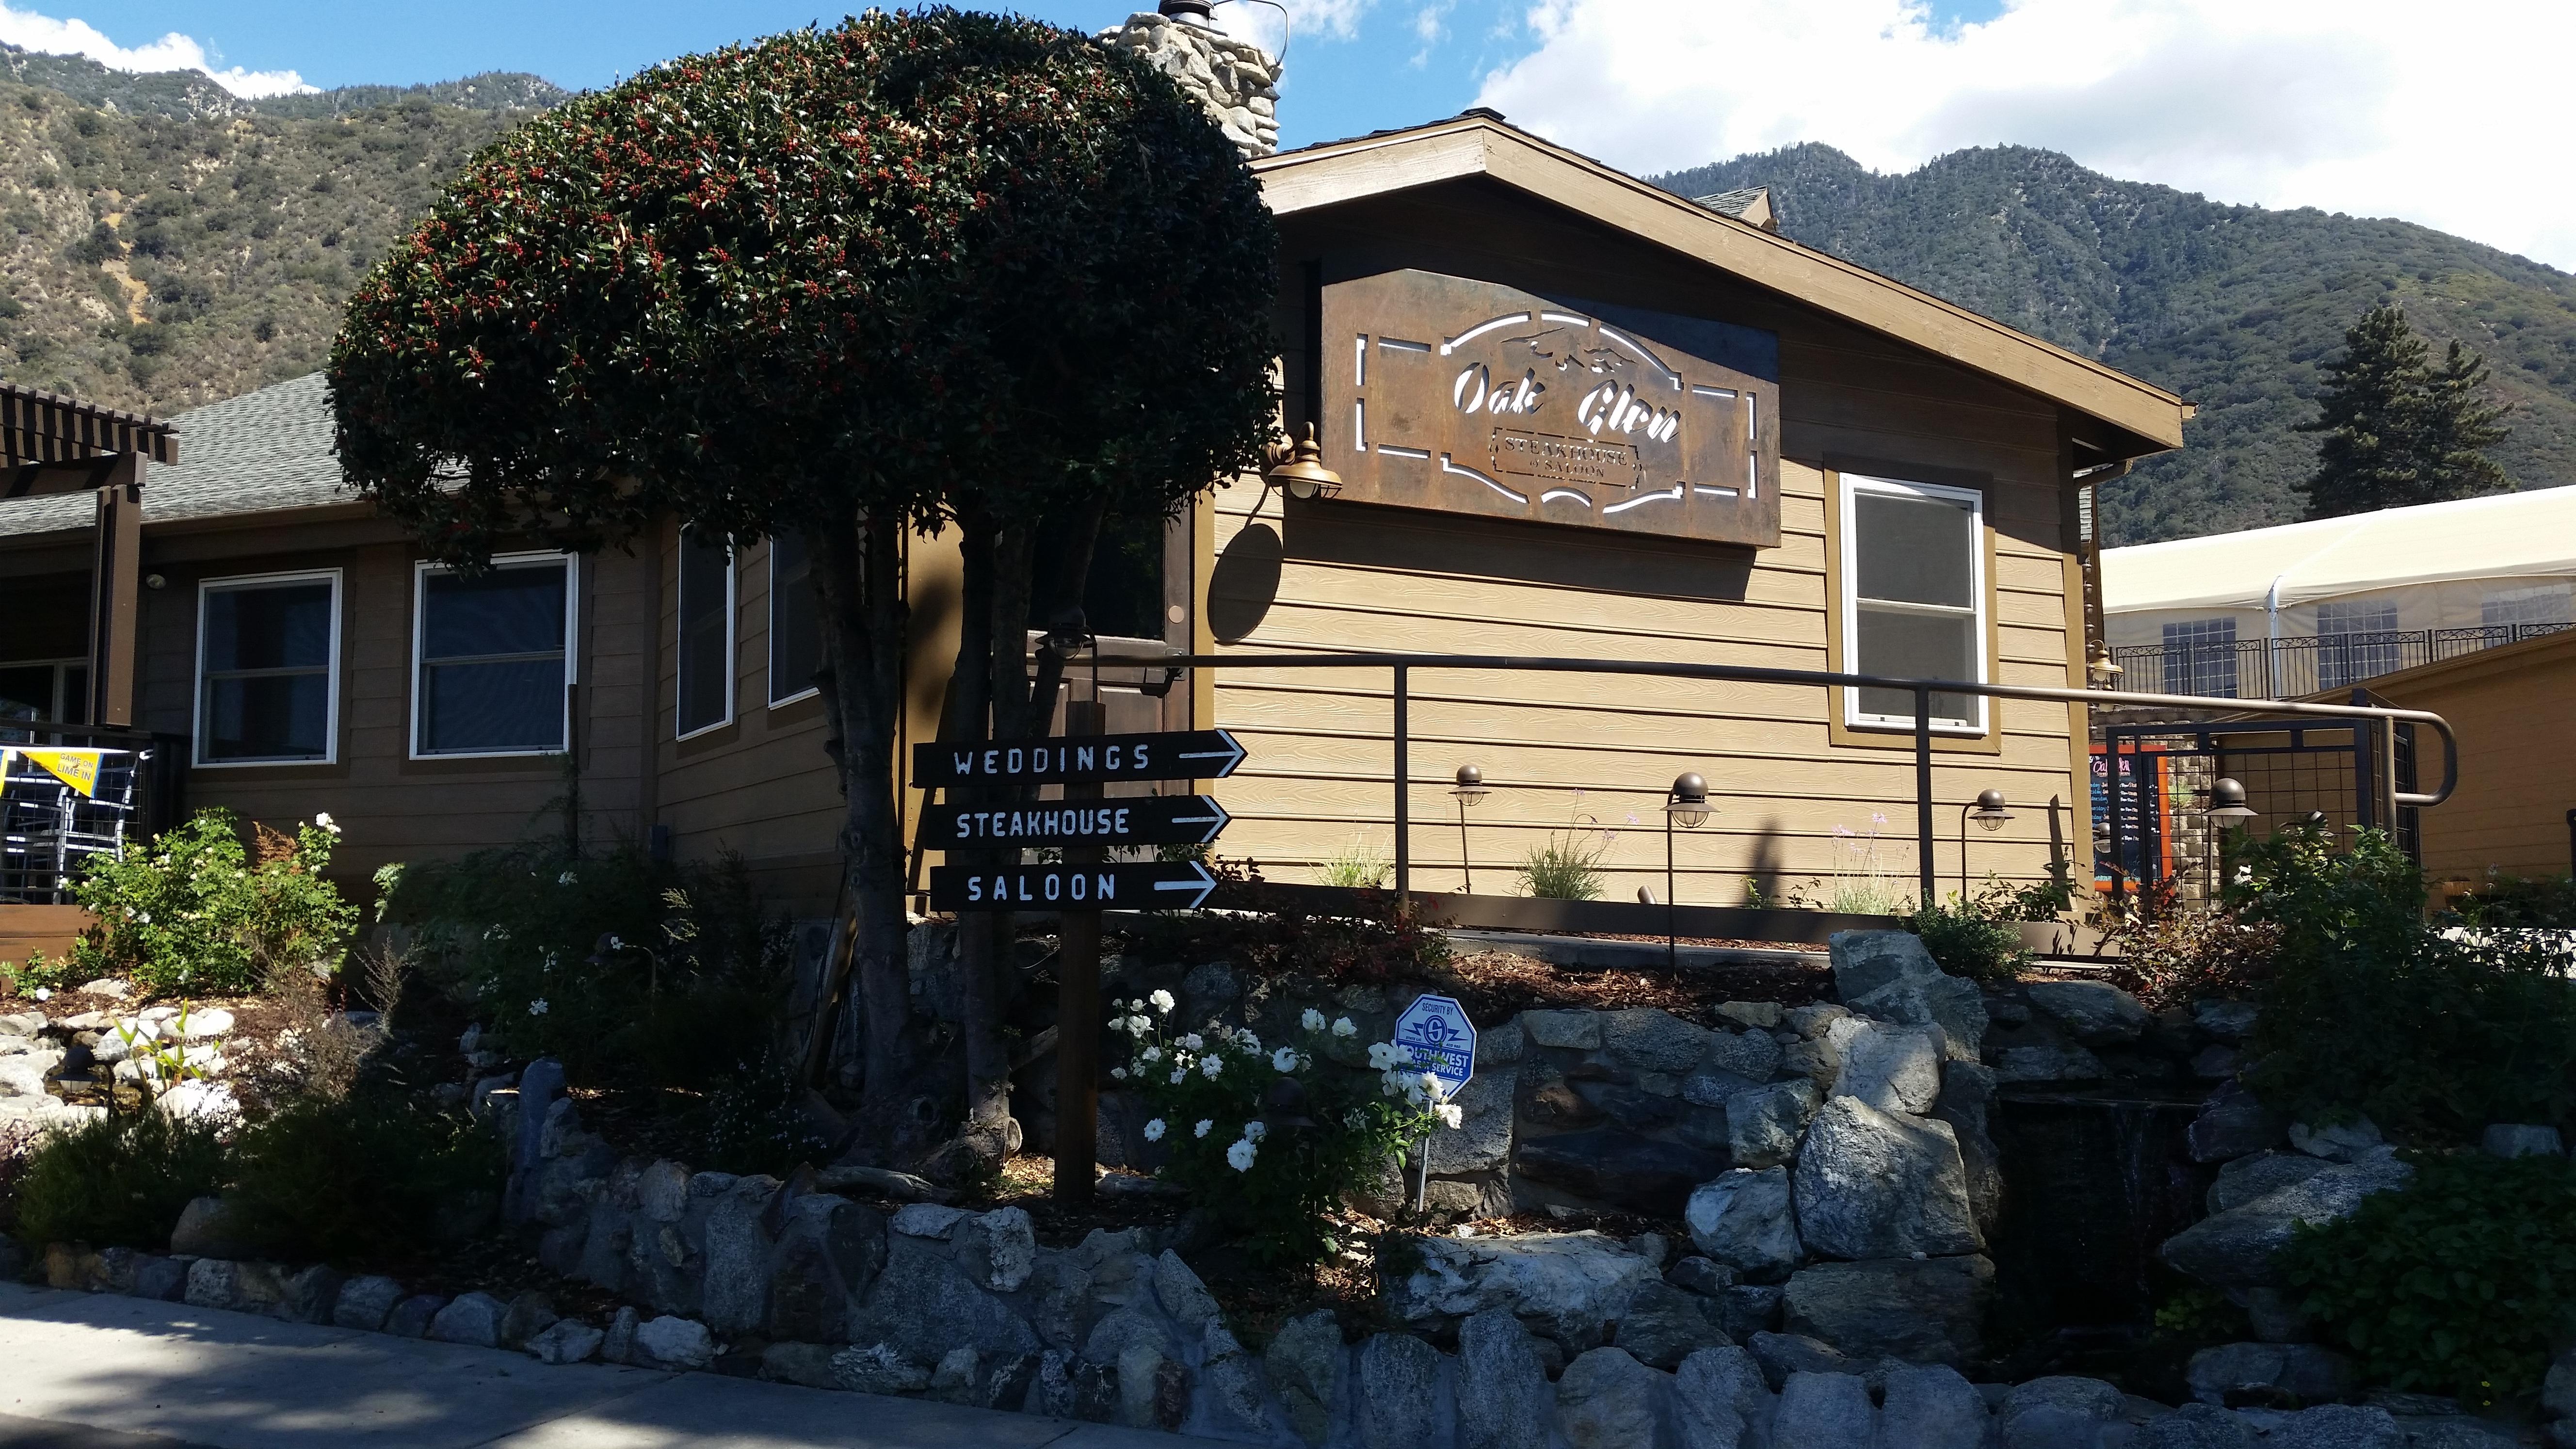 Inland Empire Restaurants Oak Glen Steakhouse Saloon